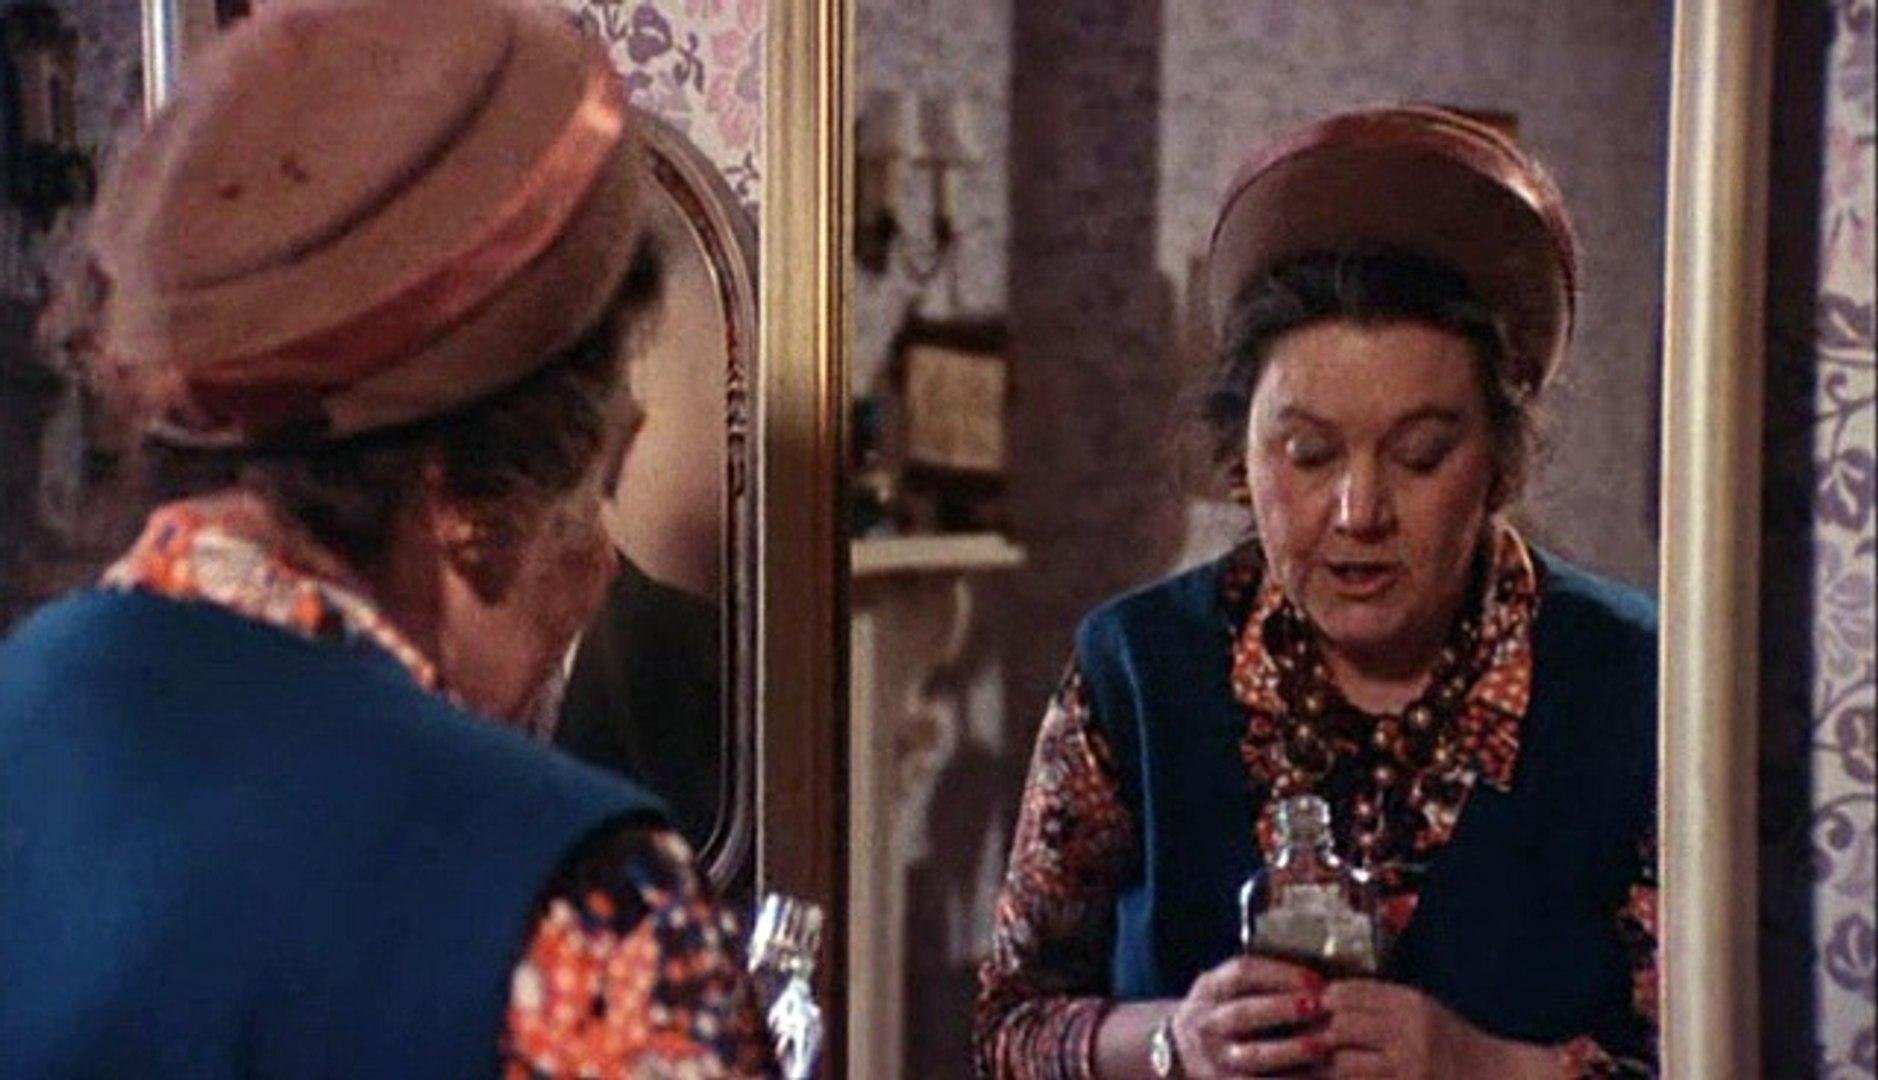 Black Christmas 1974.Black Christmas 1974 Olivia Hussey Keir Dullea Margot Kidder Feature Horror Mystery Thriller